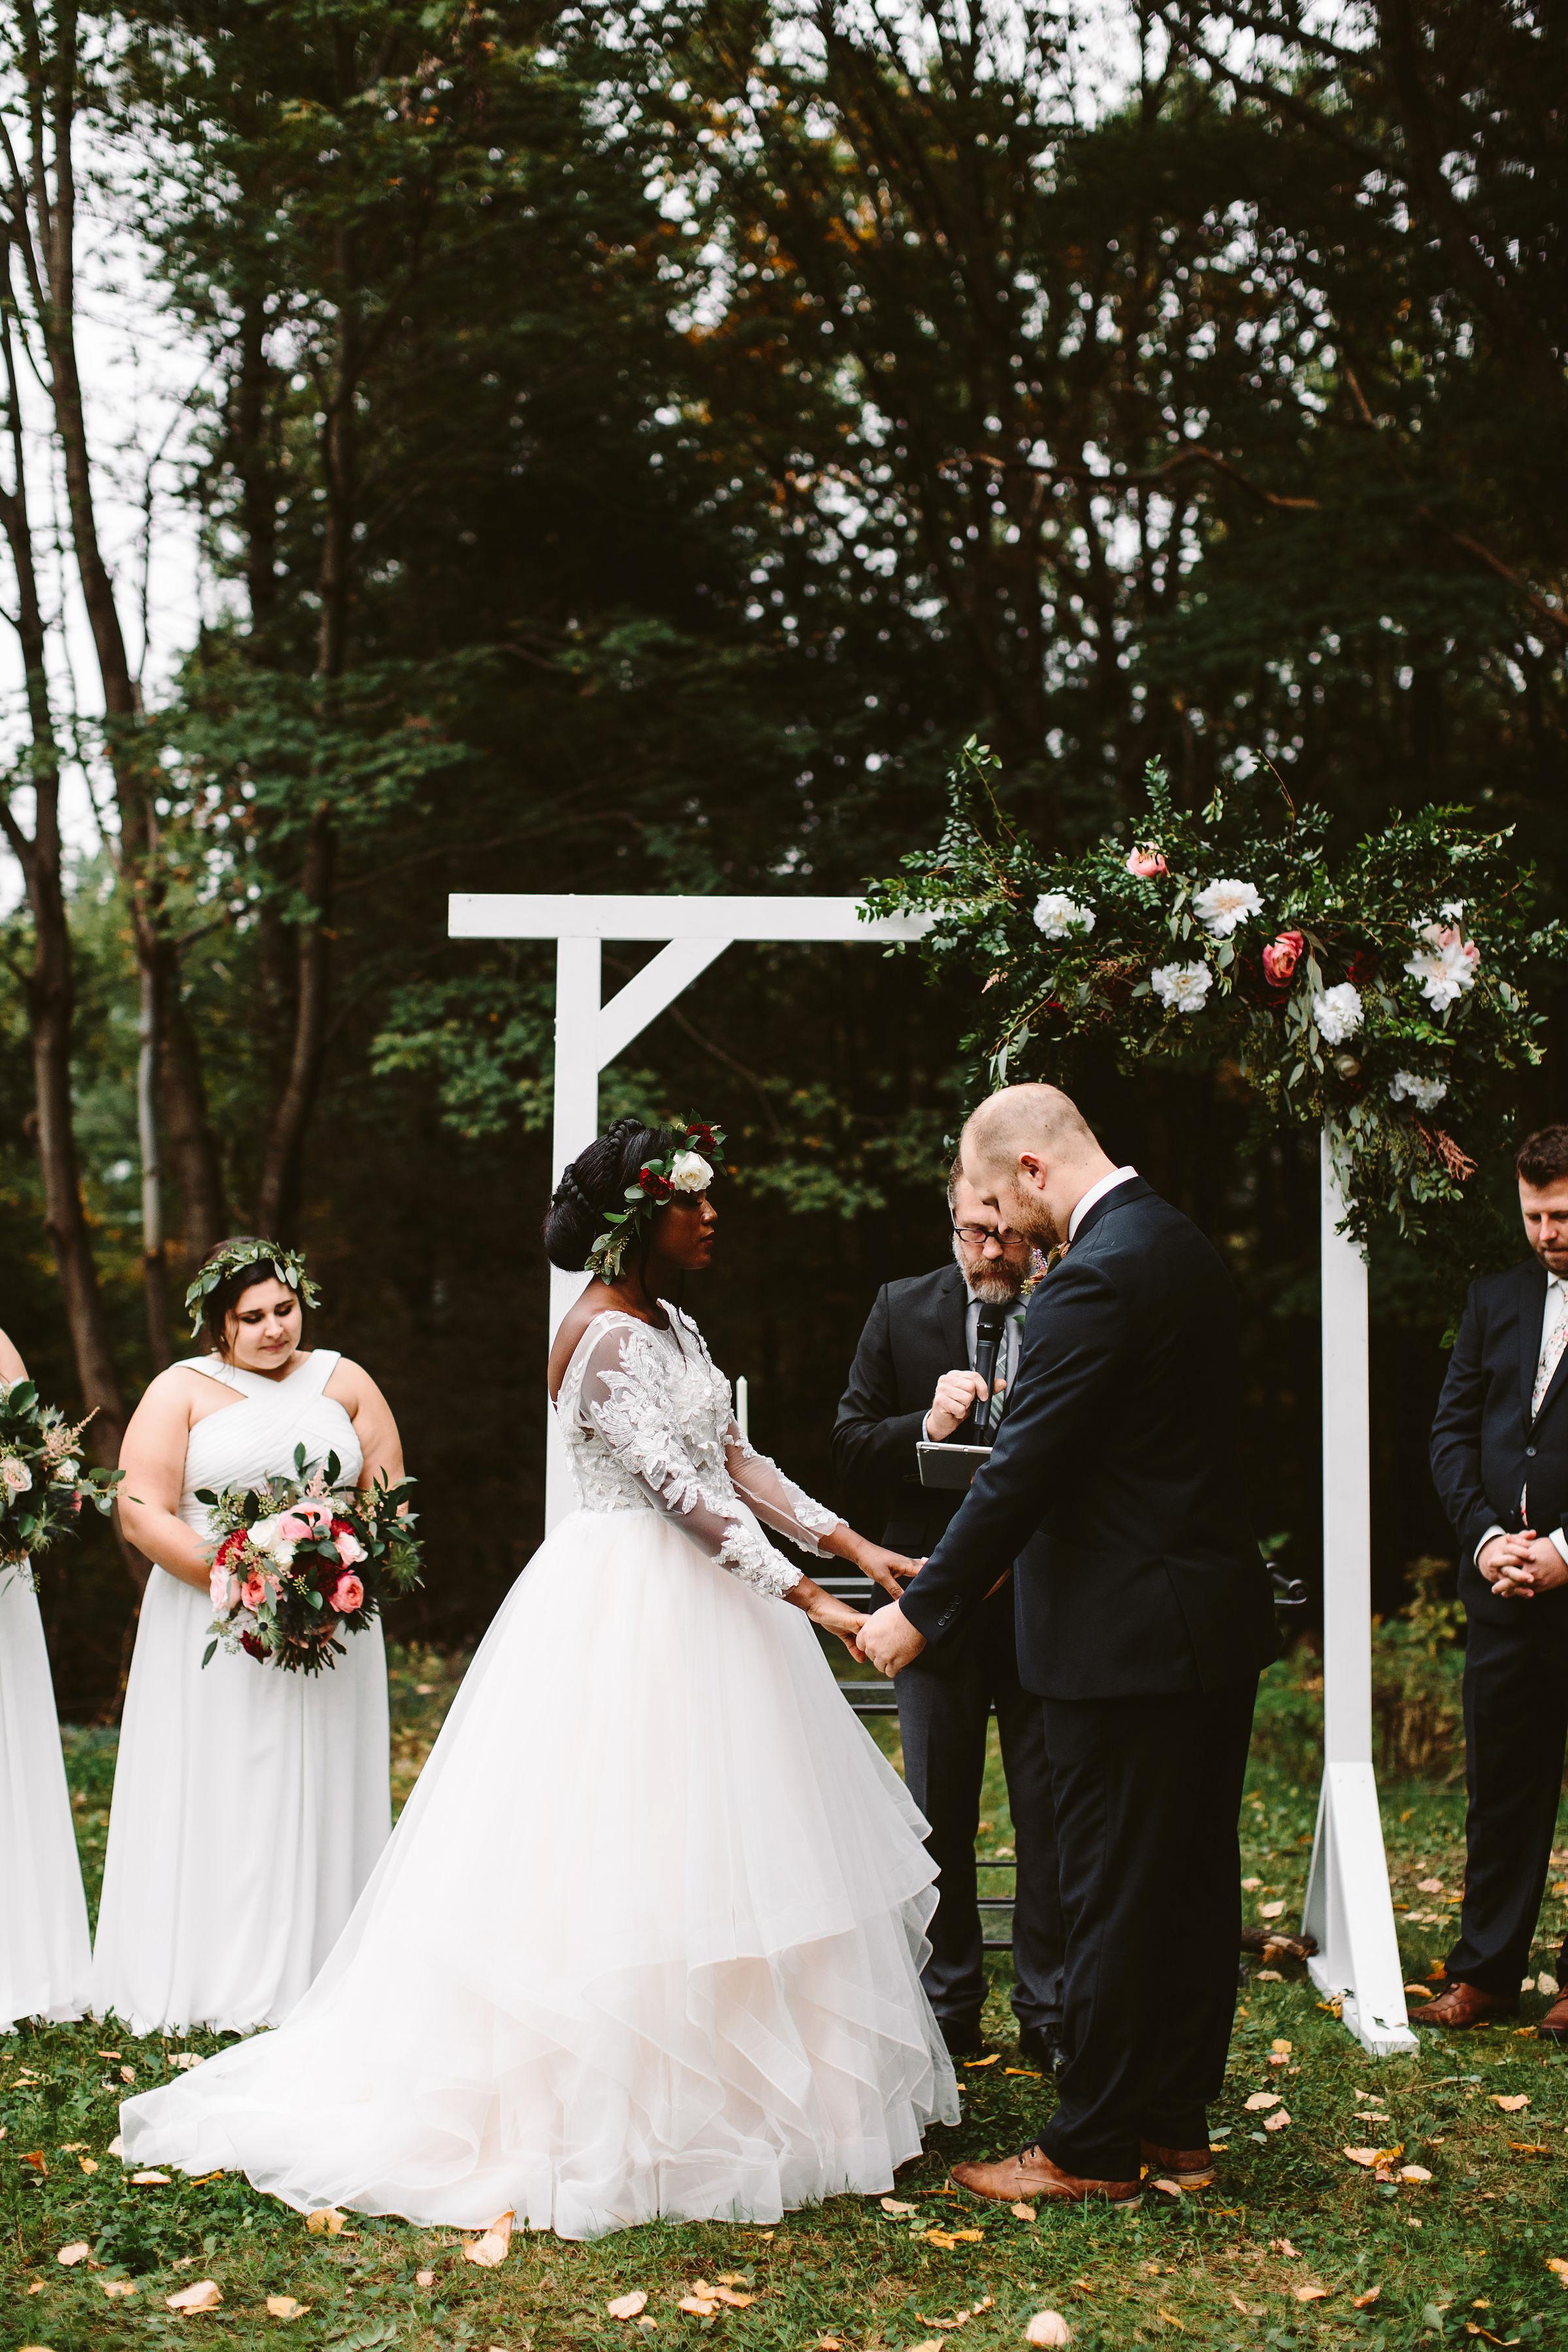 rivka aaron wedding ceremony couple holding hands